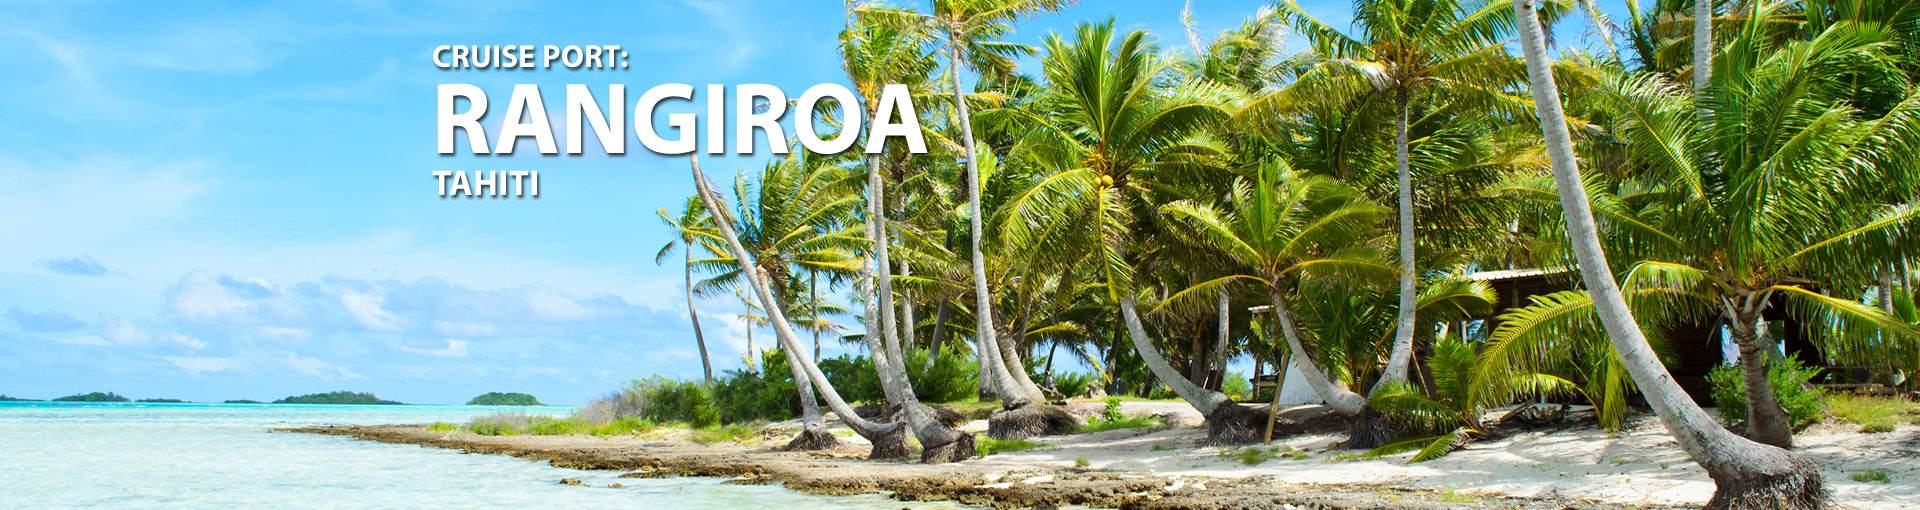 Cruises to Rangiroa, Tahiti